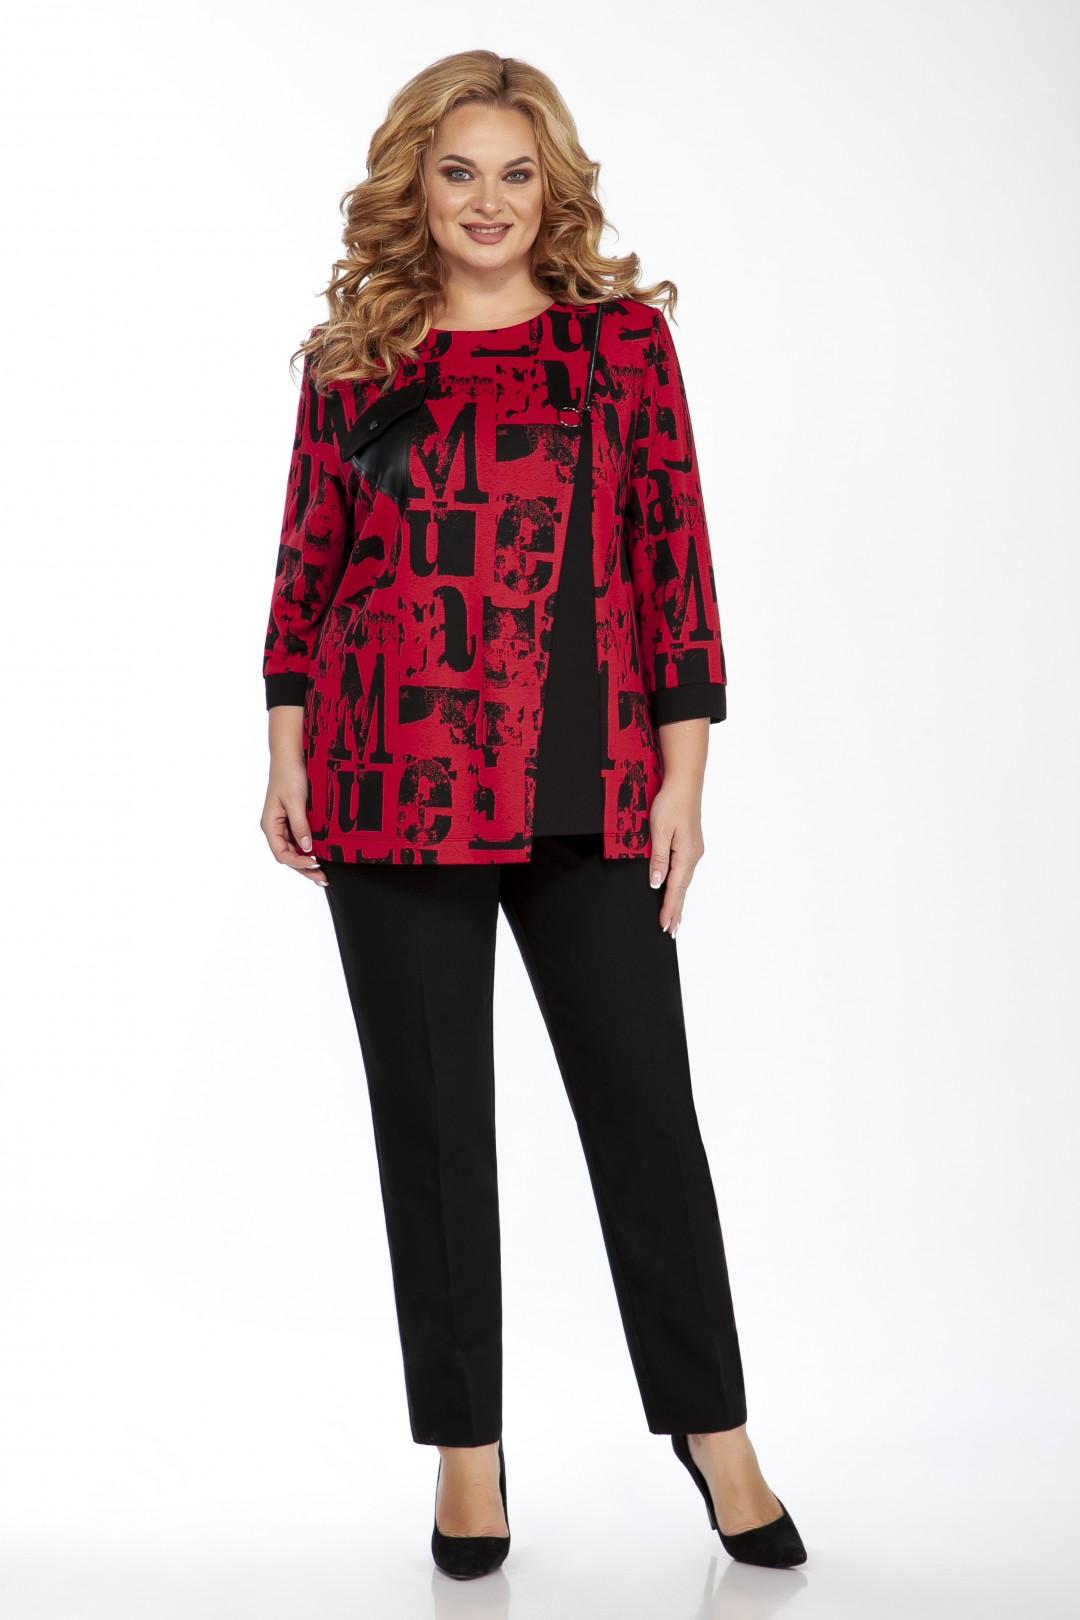 Блуза EMILIA STYLE 2099.1 красный